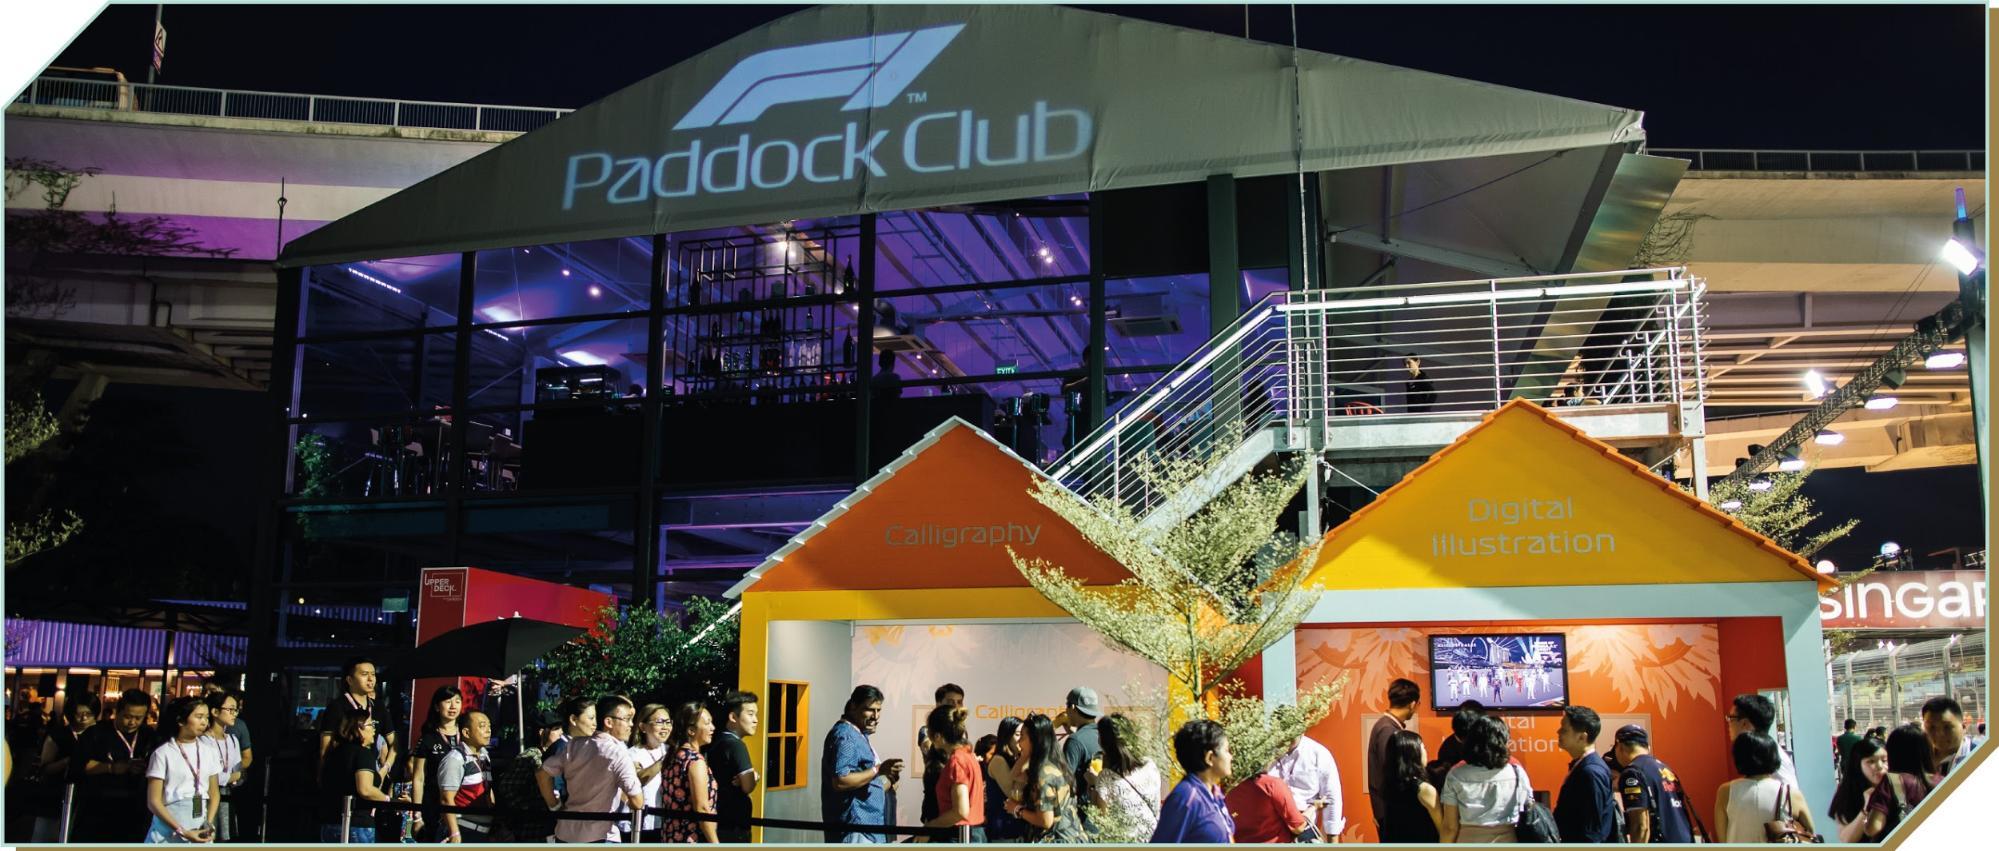 Singapore Grand Prix 2019 - Paddock Club